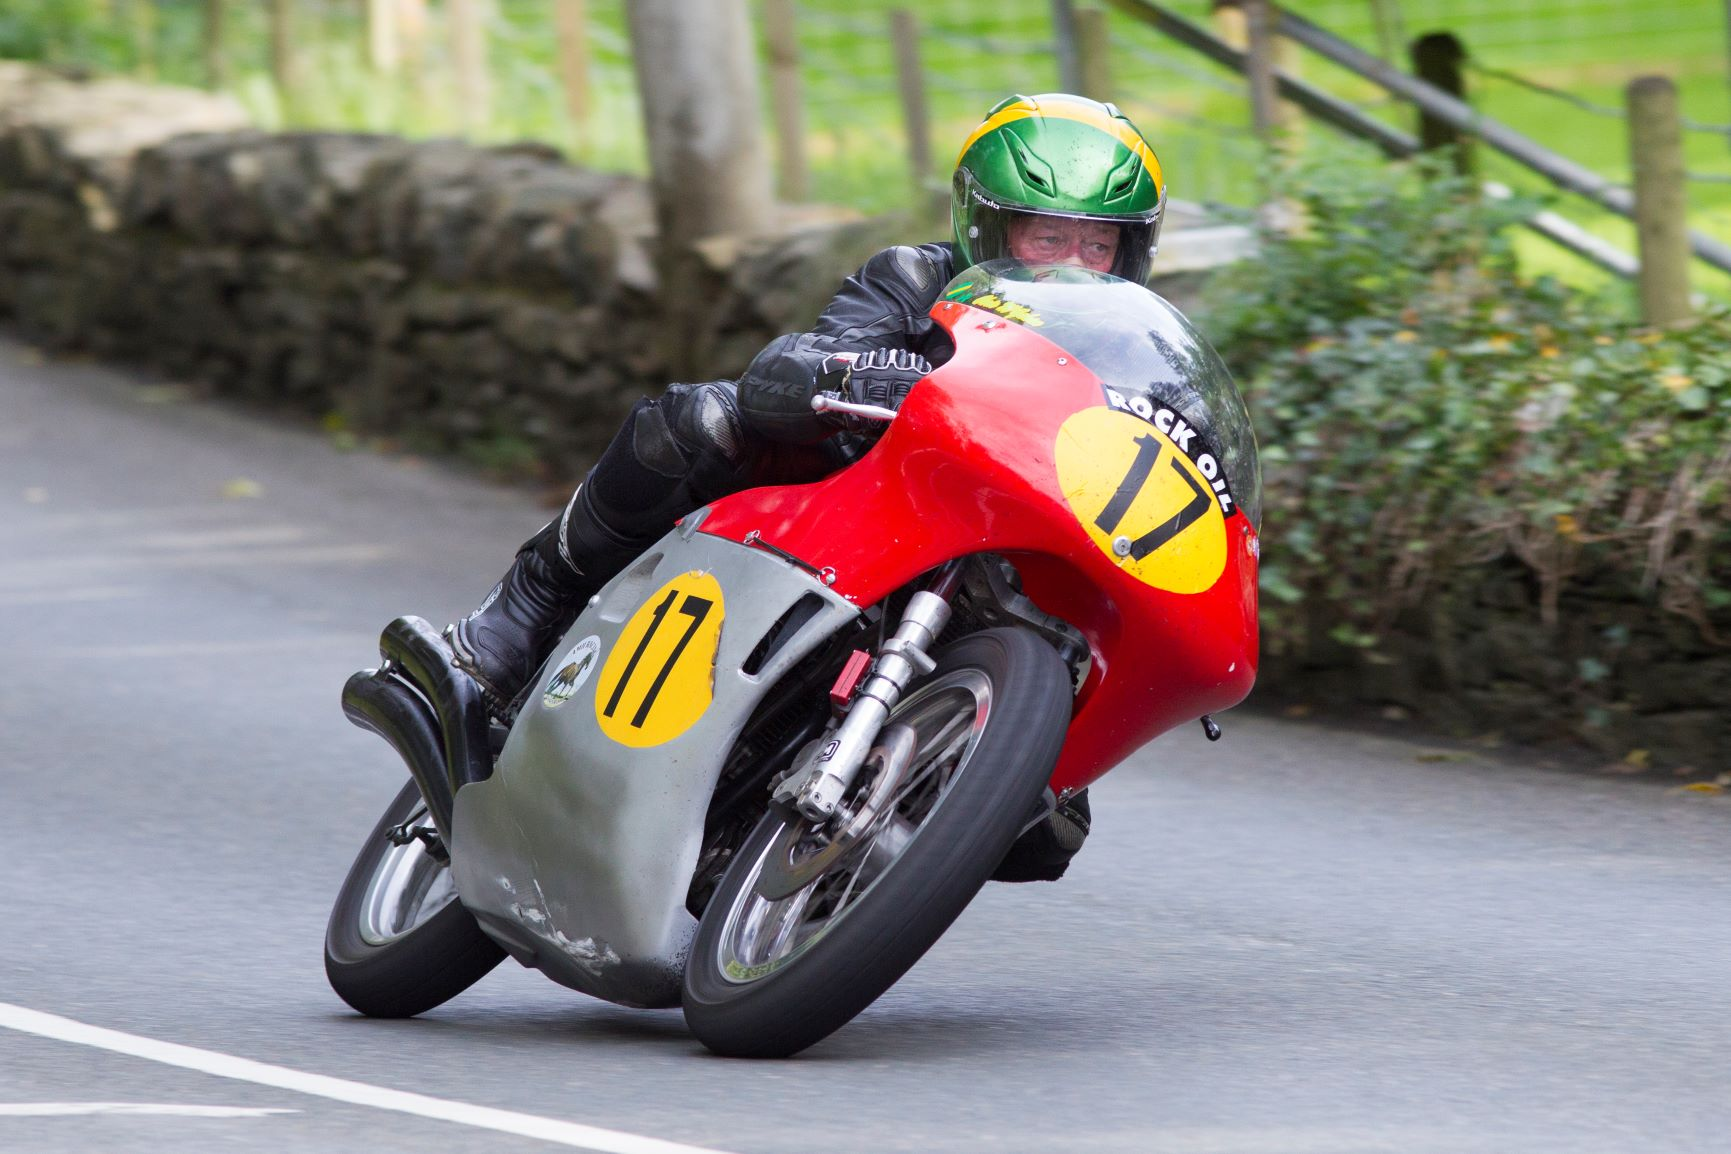 Manx Favourites Evans, McGahan Link Up For Senior Classic TT